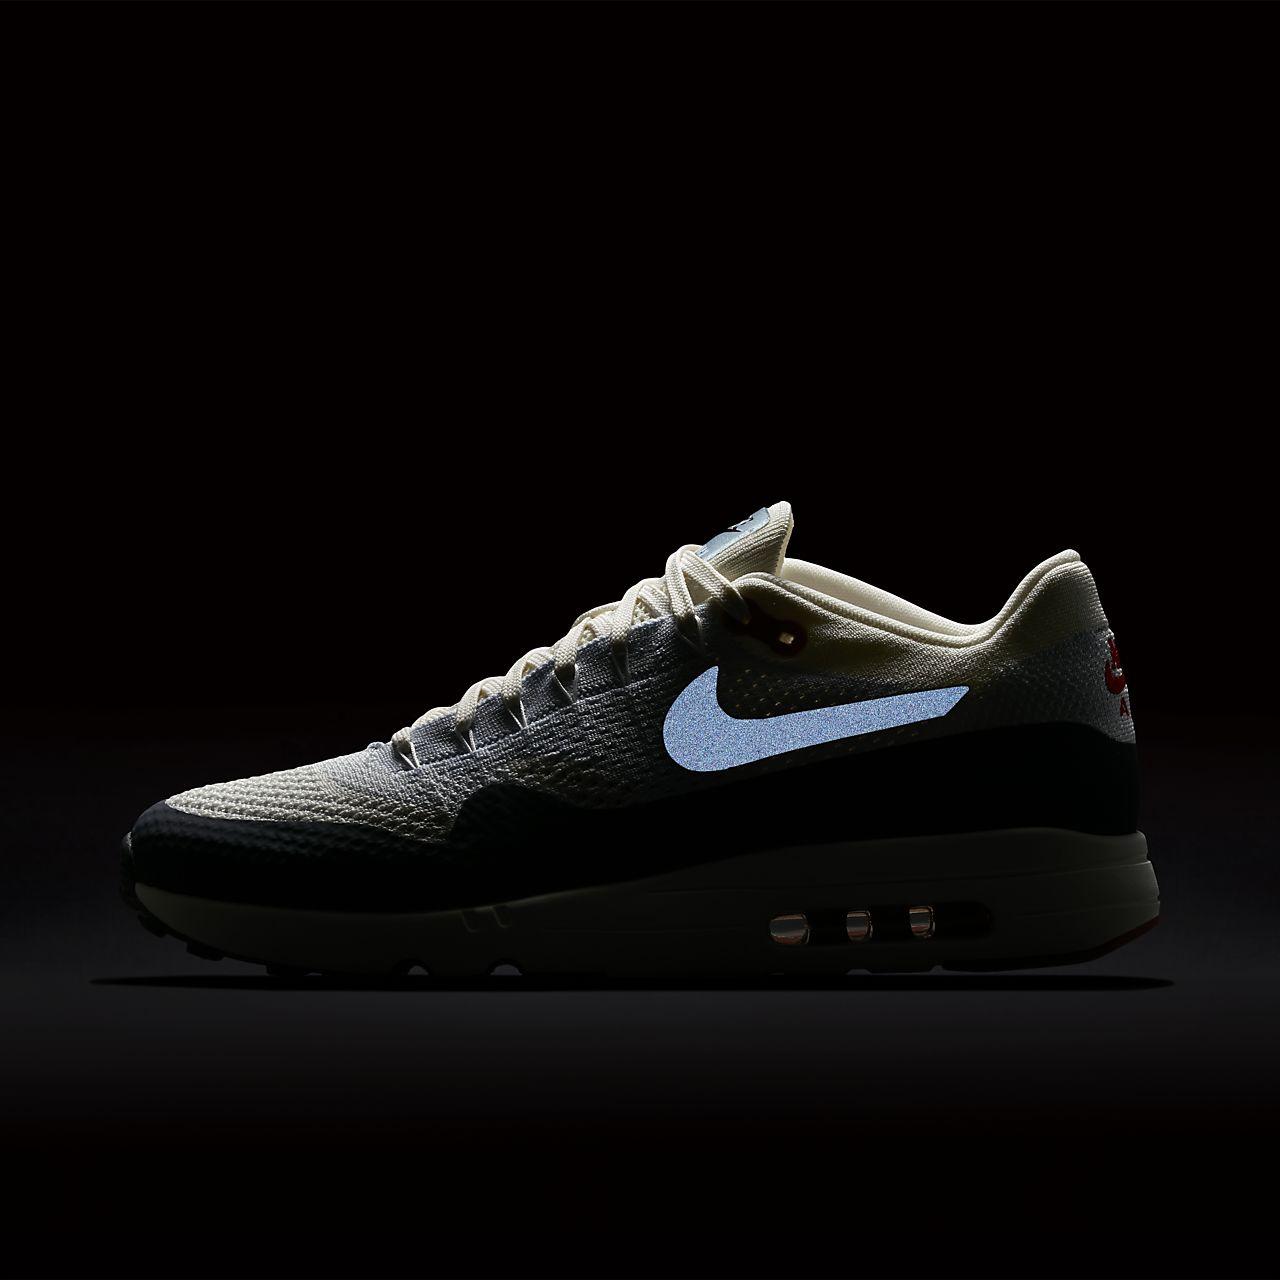 7ad9e81fb9 Nike Air Max 1 Ultra 2.0 Flyknit Men's Shoe. Nike.com MY